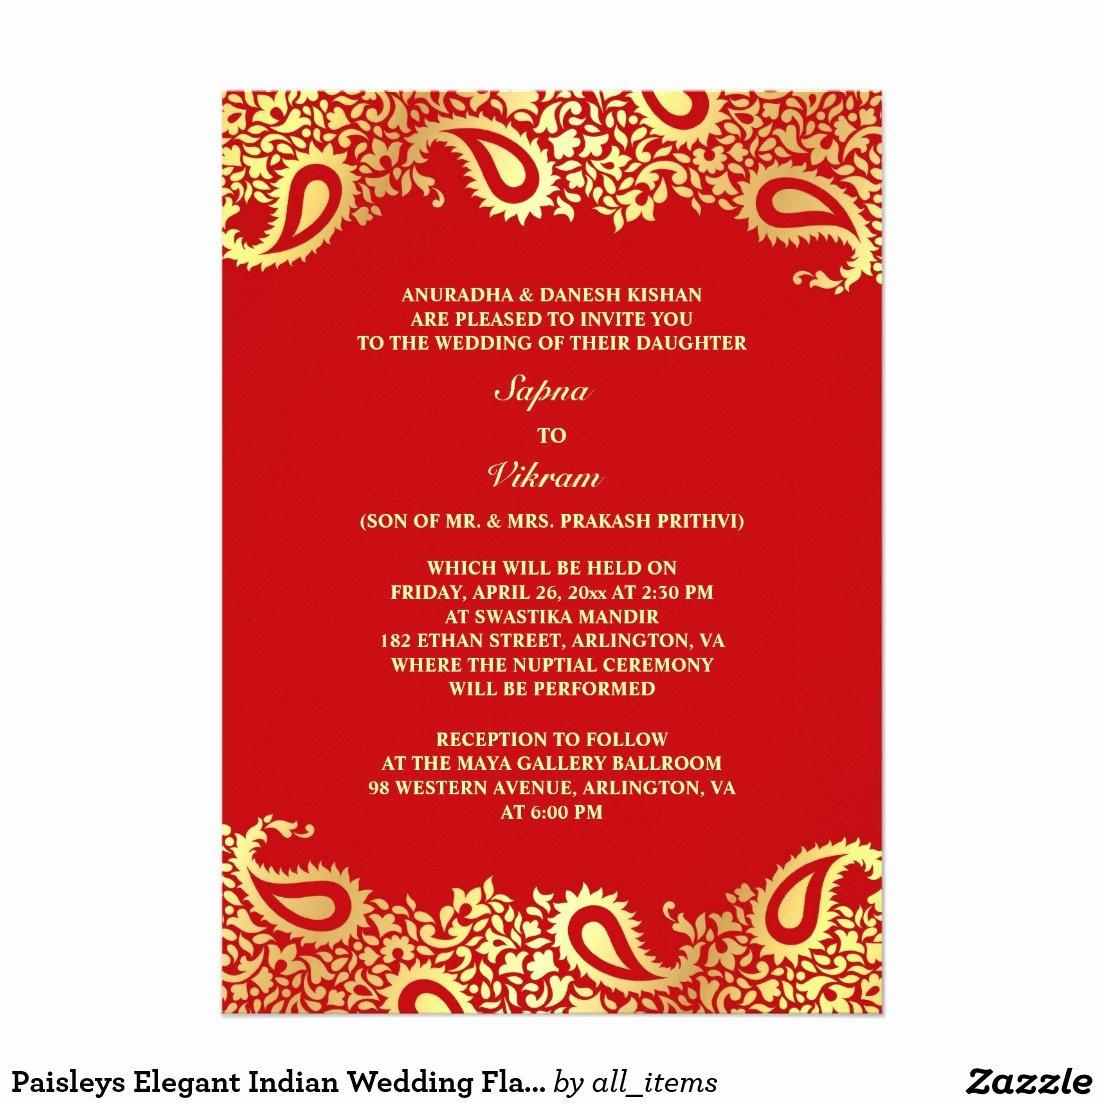 Hindu Wedding Invitation Template Awesome Indian Wedding Invitations Templates